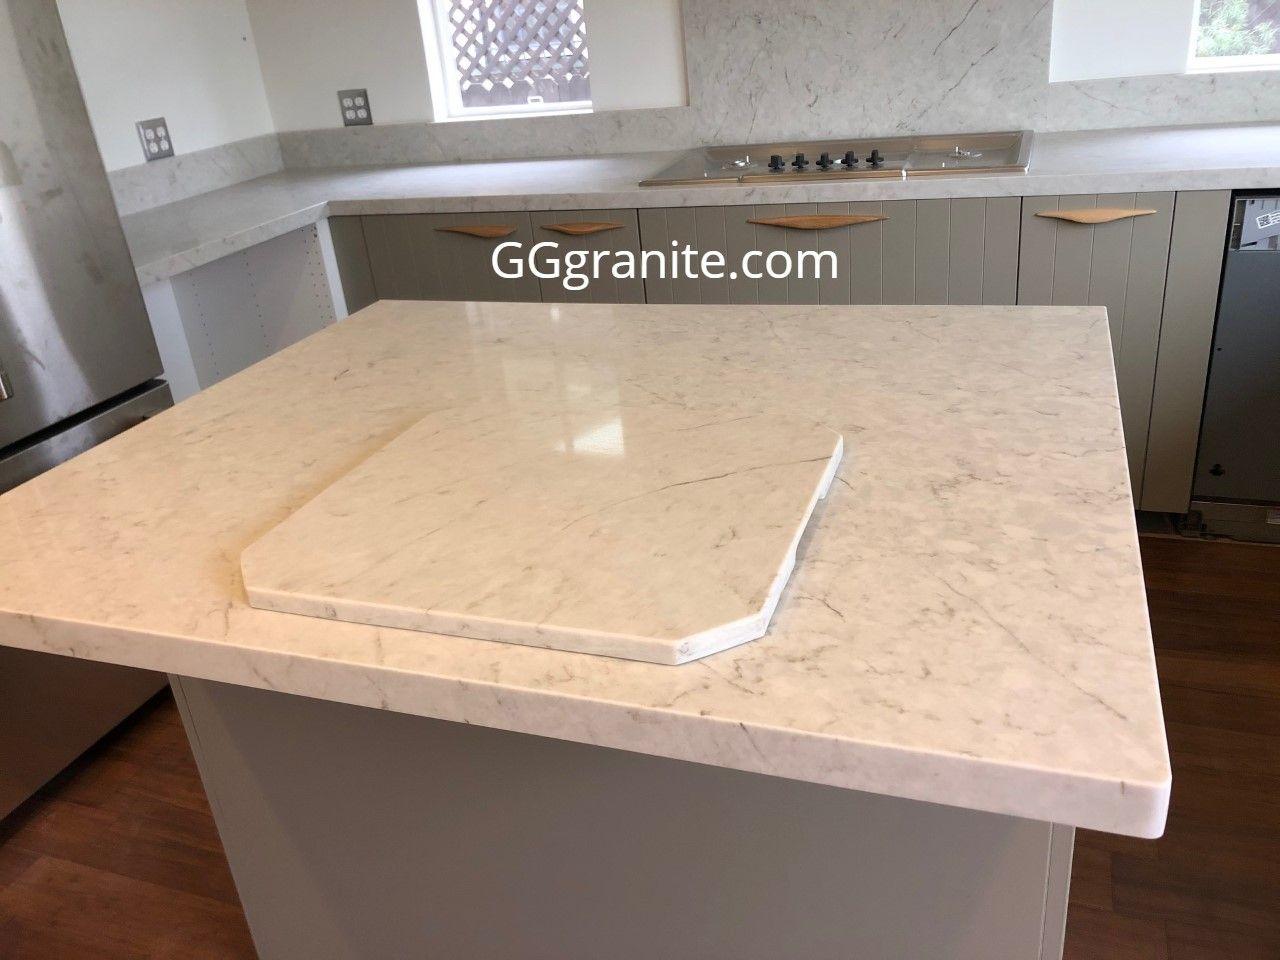 G Granite Quartz Countertops